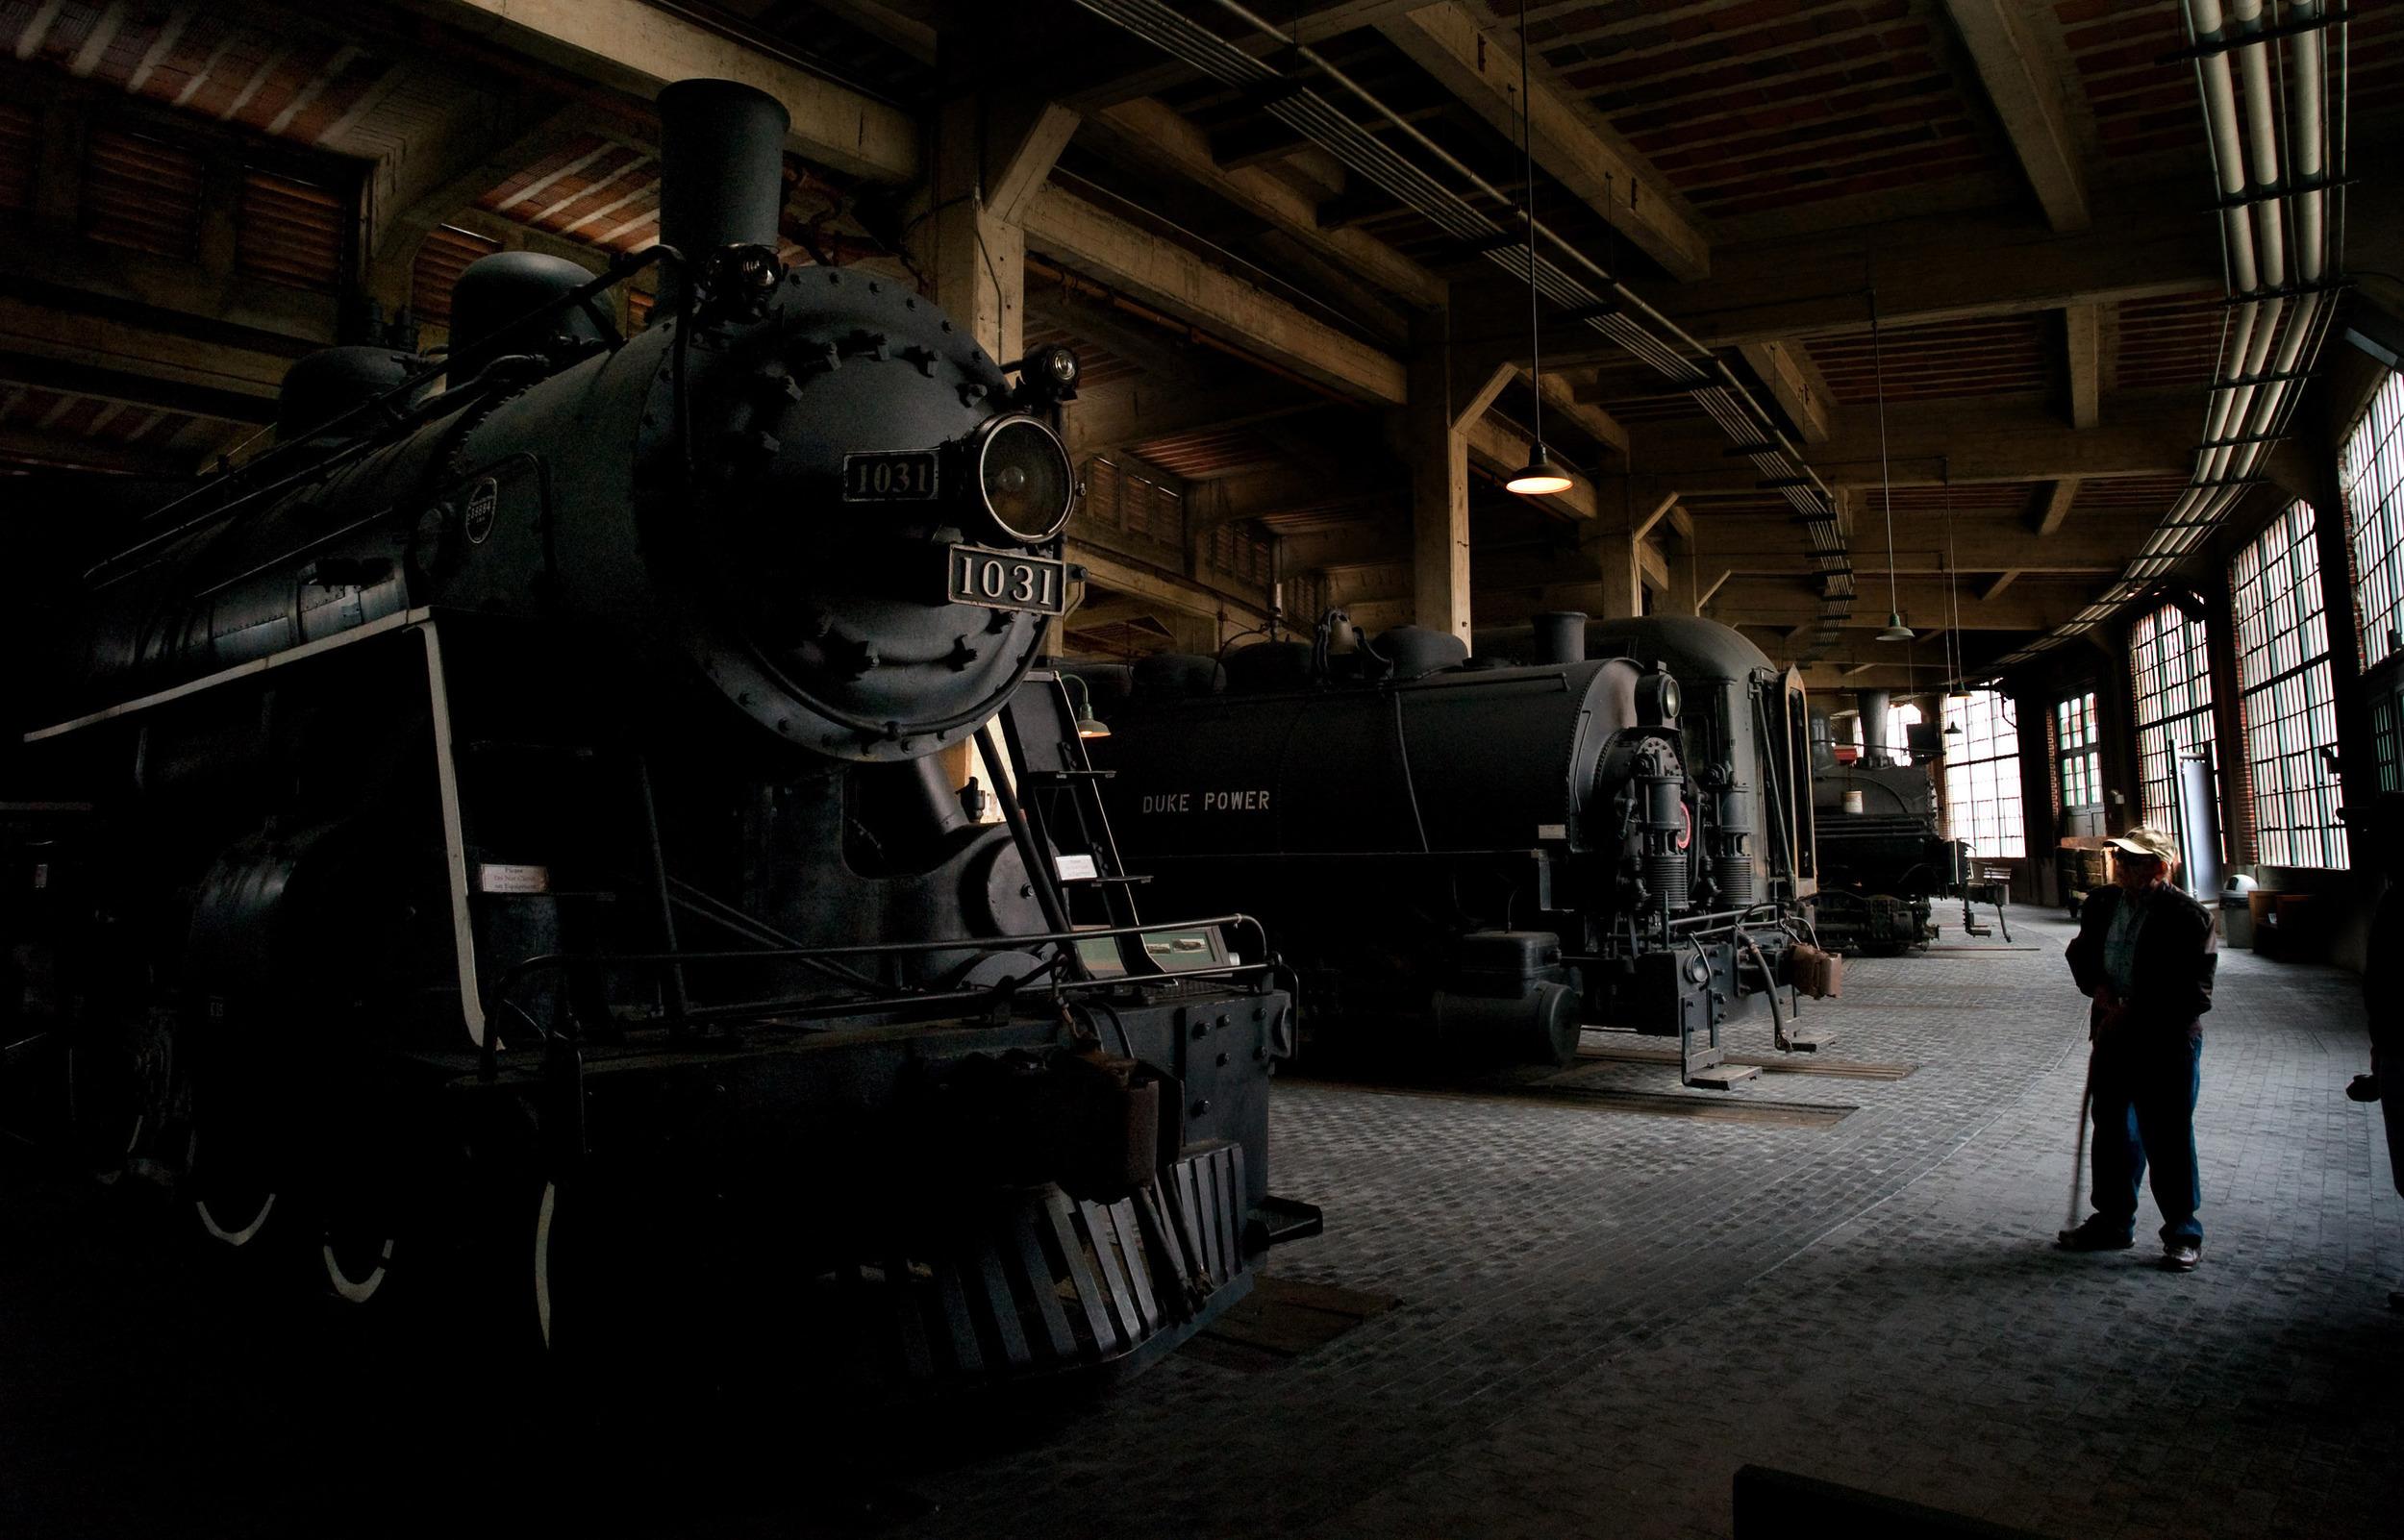 Spencer Engine1031.jpg